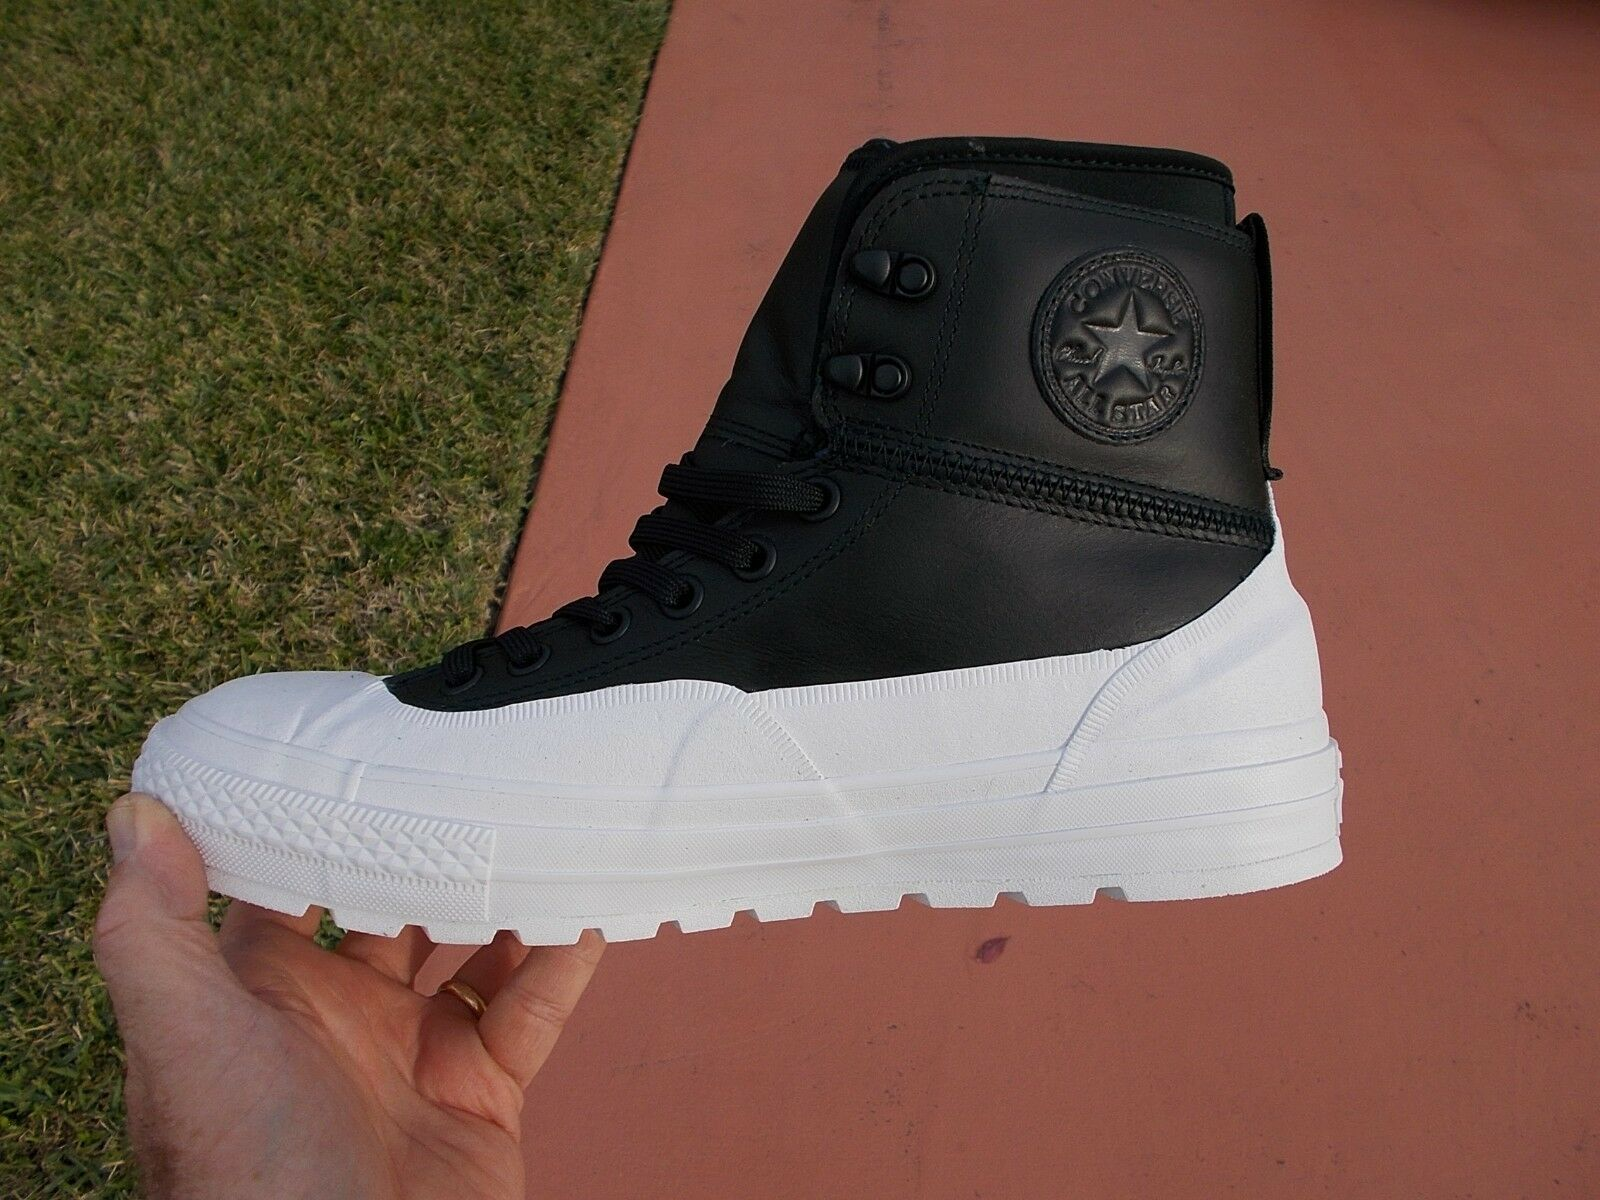 Men's Converse Chuck Taylor Tekoa Waterproof Boot White 153657C   Size 9.5